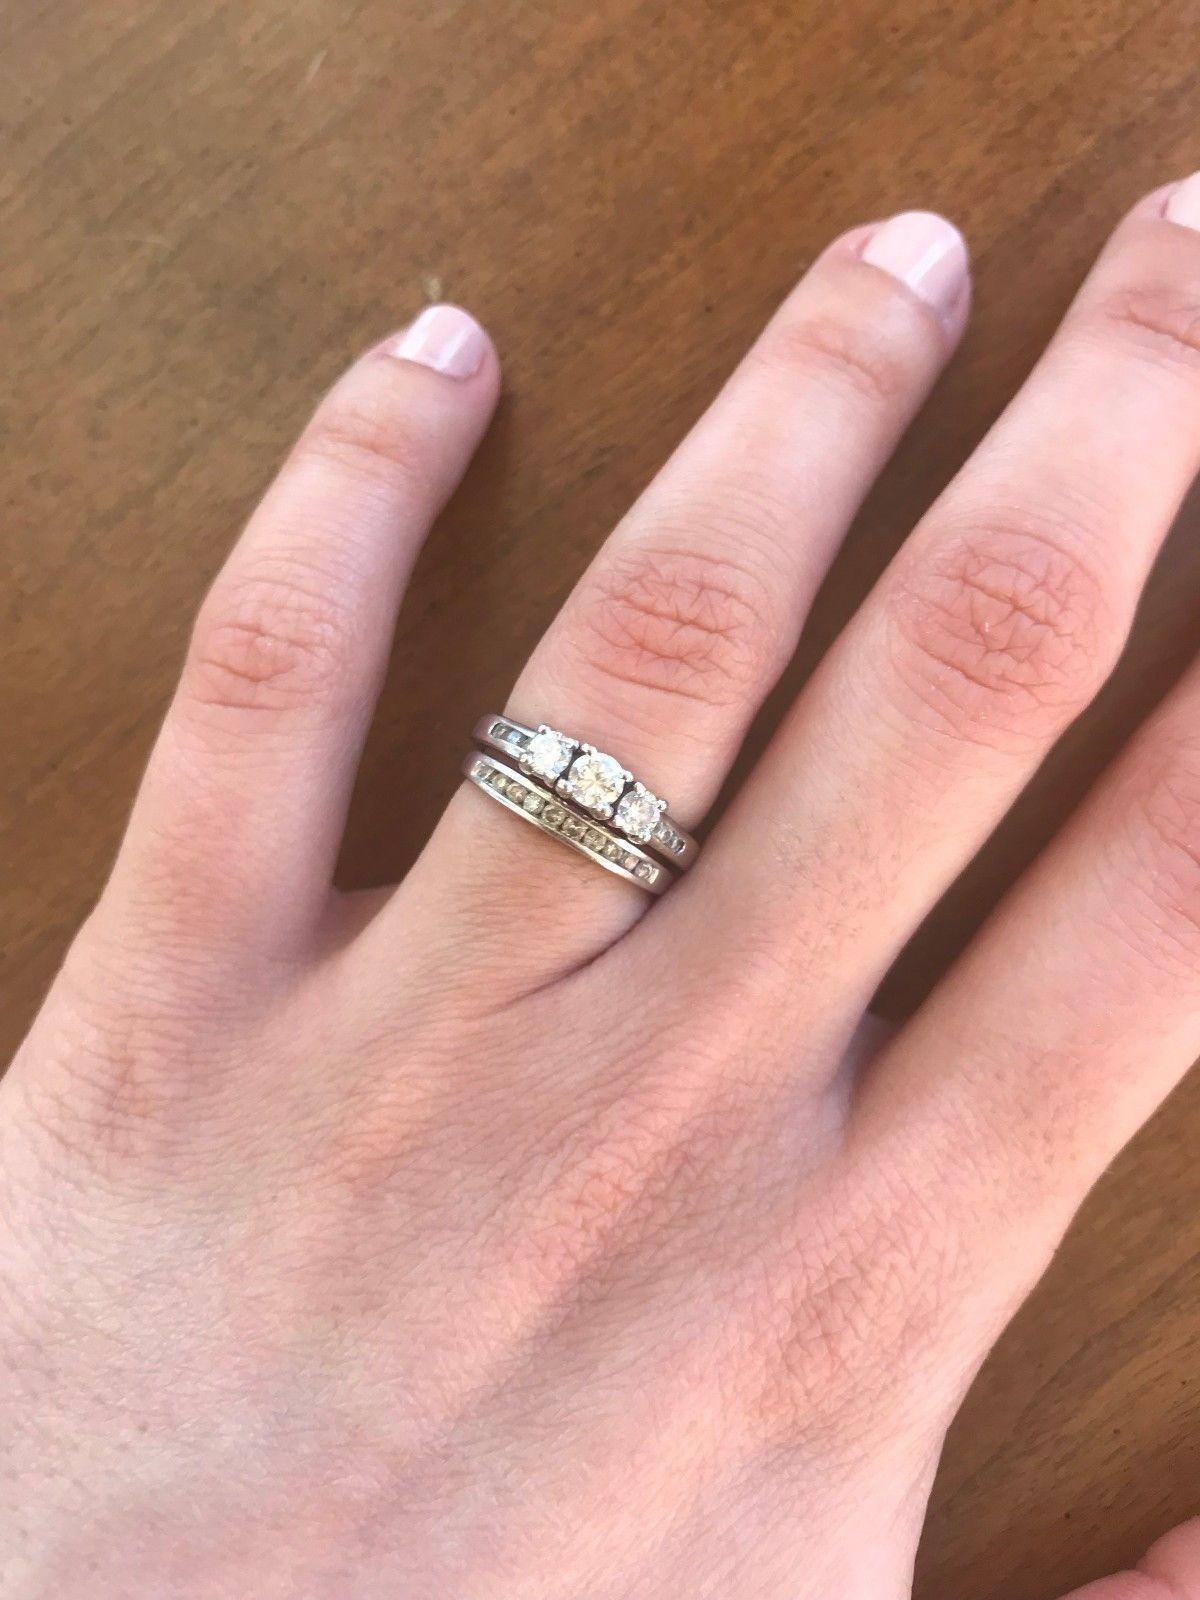 5ct 14k White Gold Engagement Ring & Wedding Band Set, size 4.5 ...